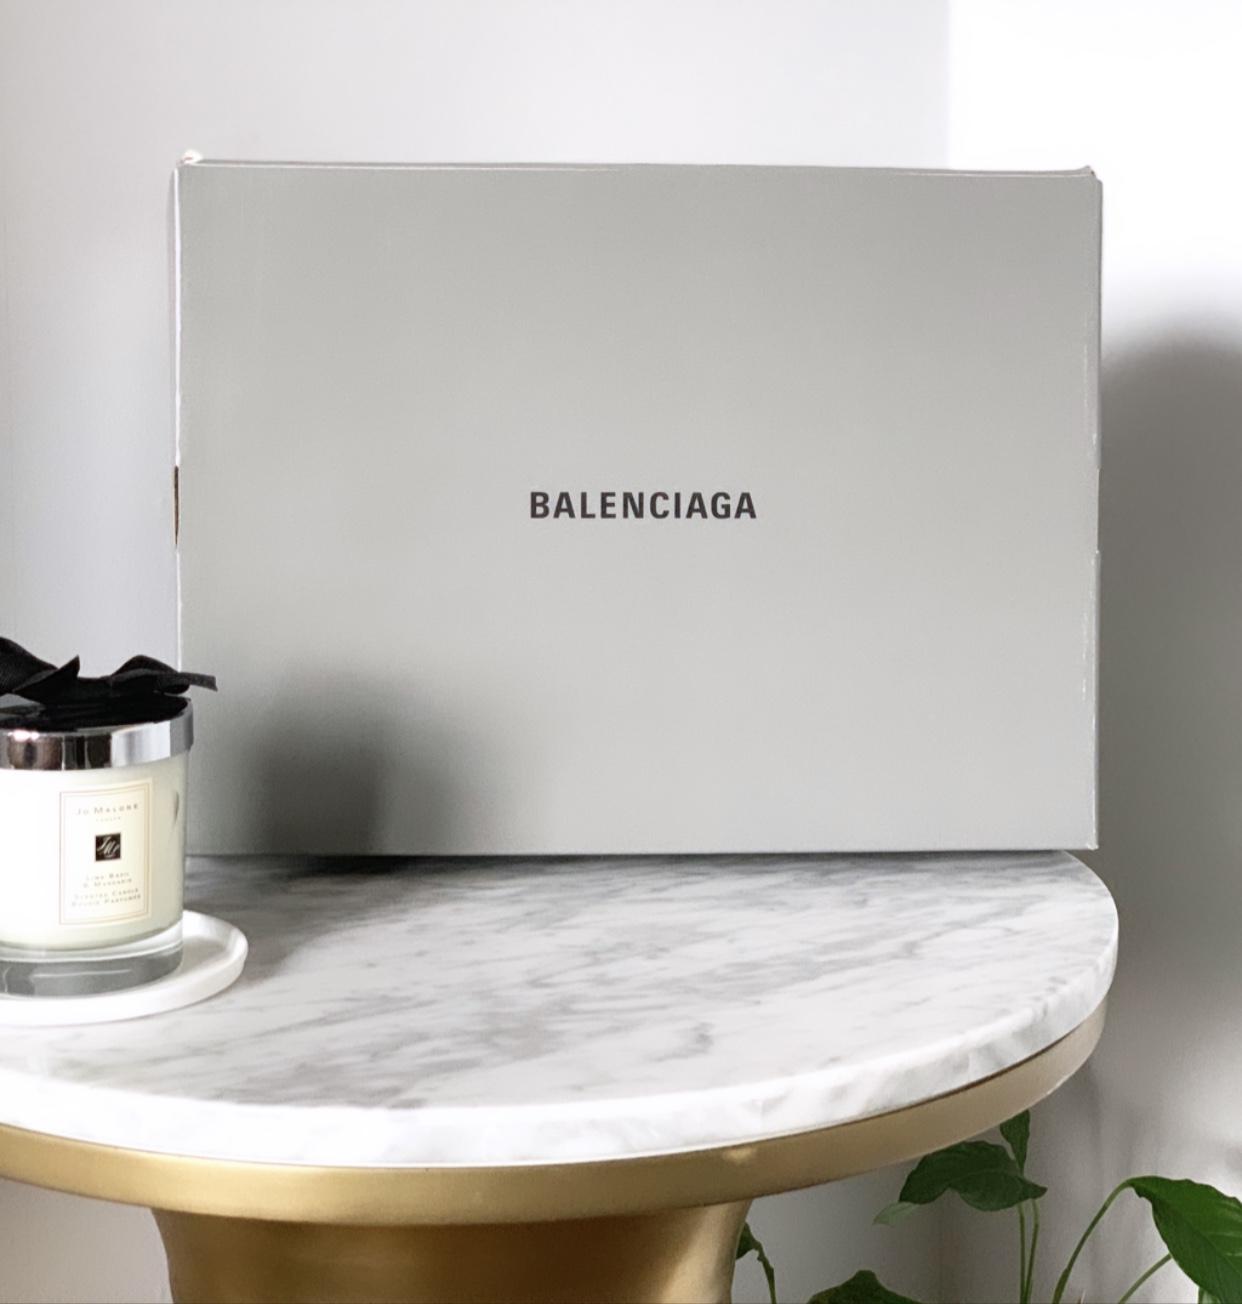 Balenciaga Unboxing. — Daisymaymoore